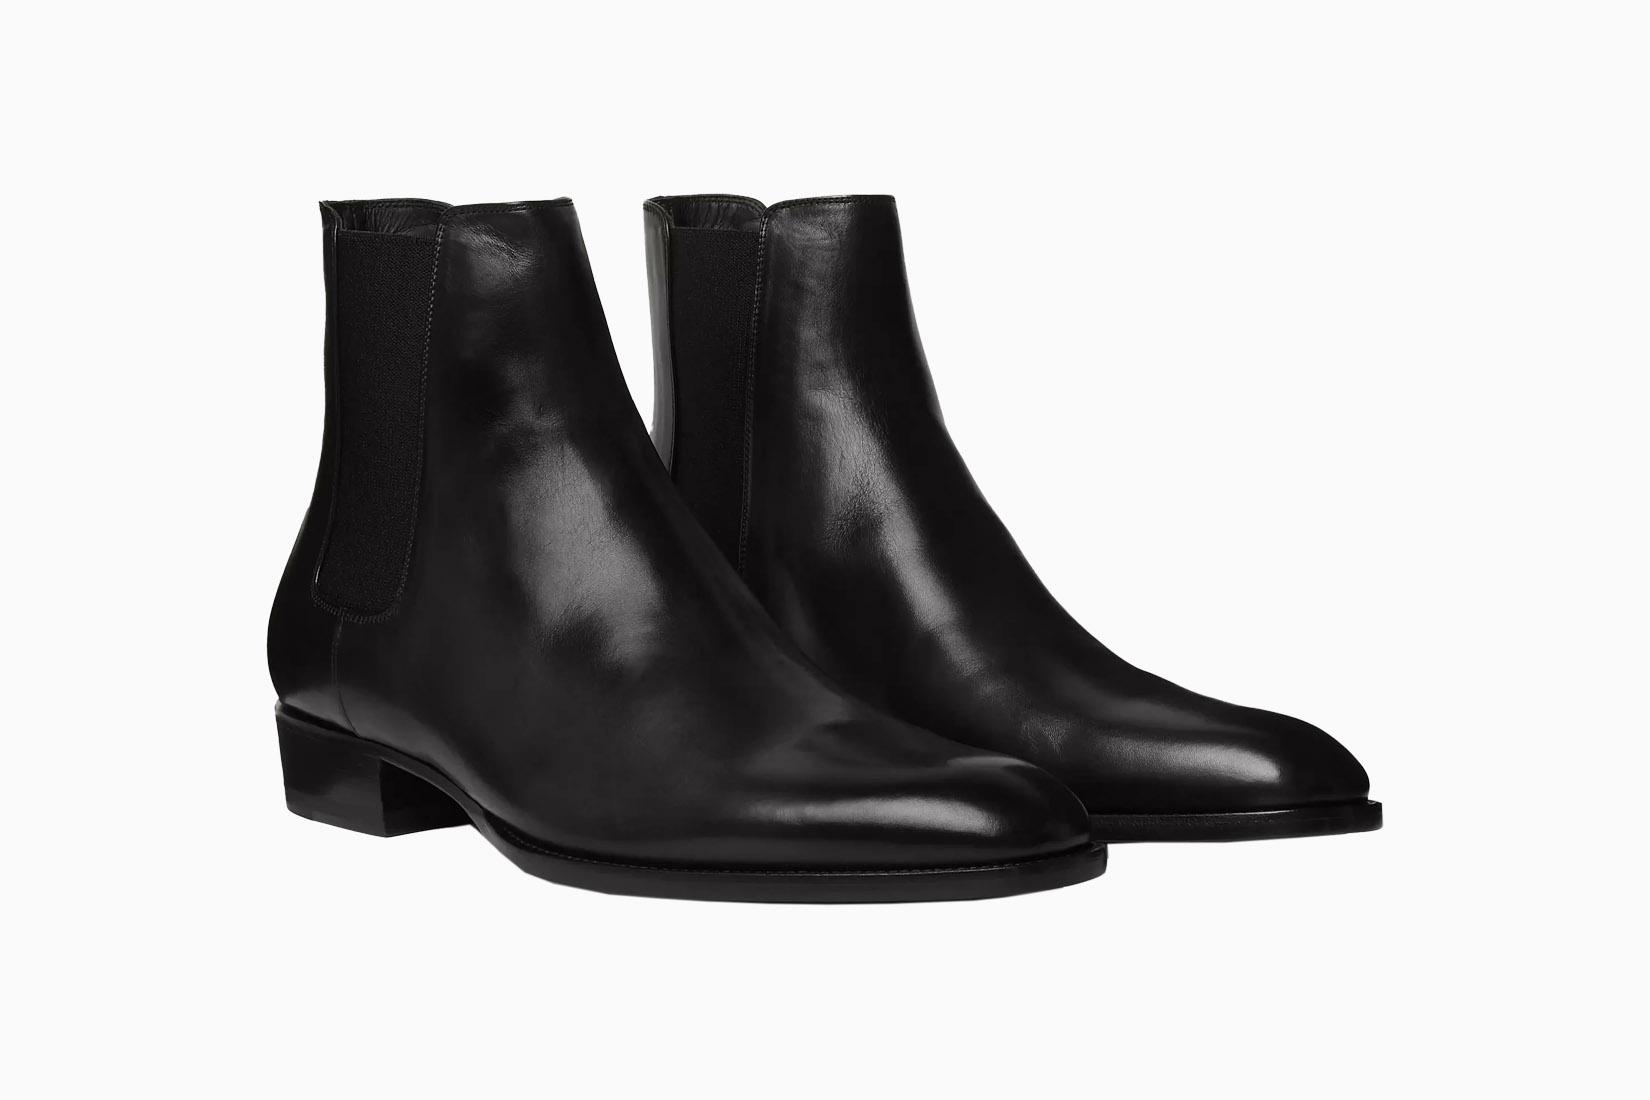 best chelsea boots saint laurent cabell review luxe